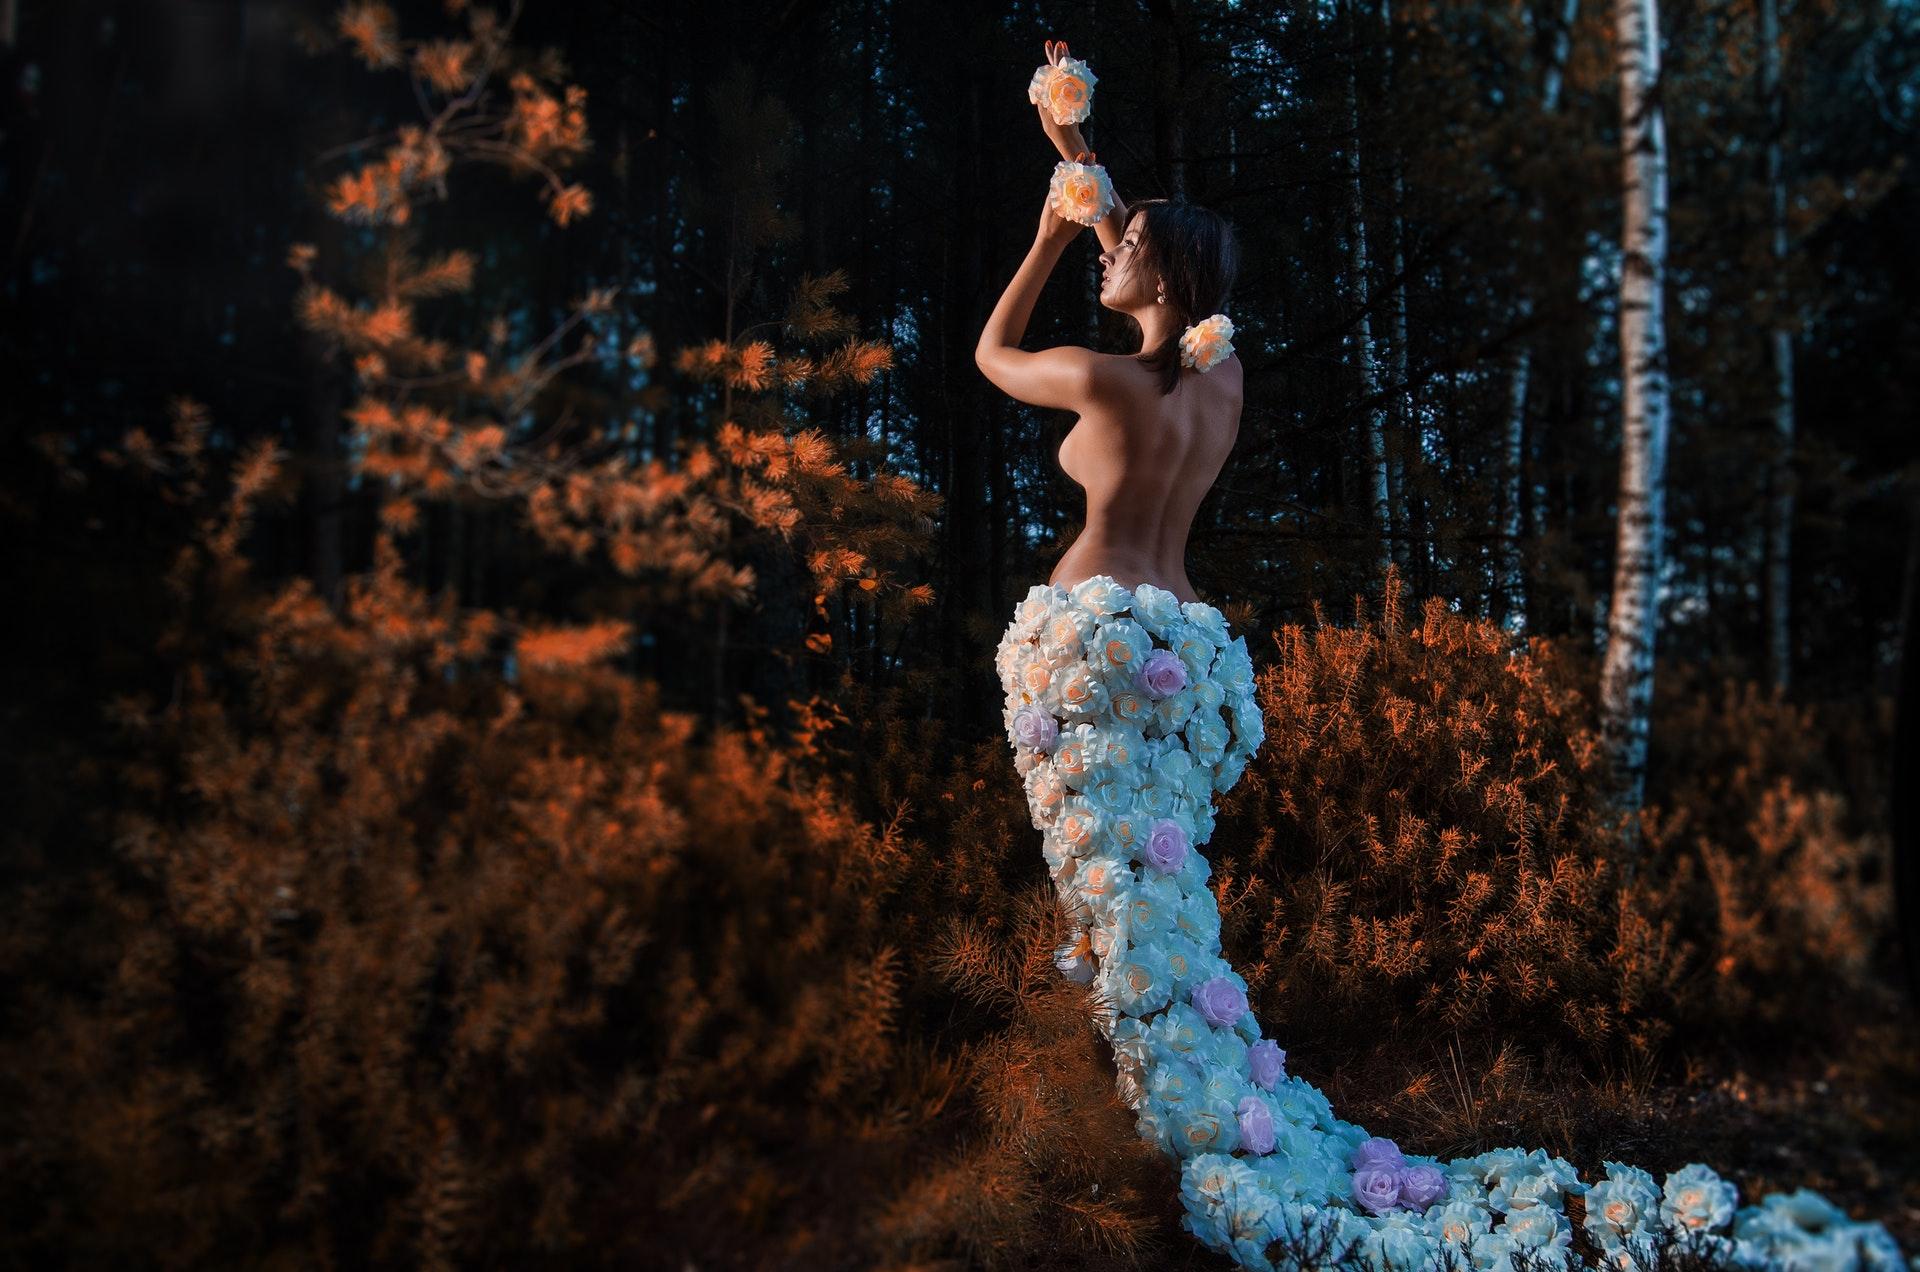 Afecteaza exhibitionismul sexul in cuplu - sfatulparintilor.ro - pexels_com - autumn-beautiful-body-1104114